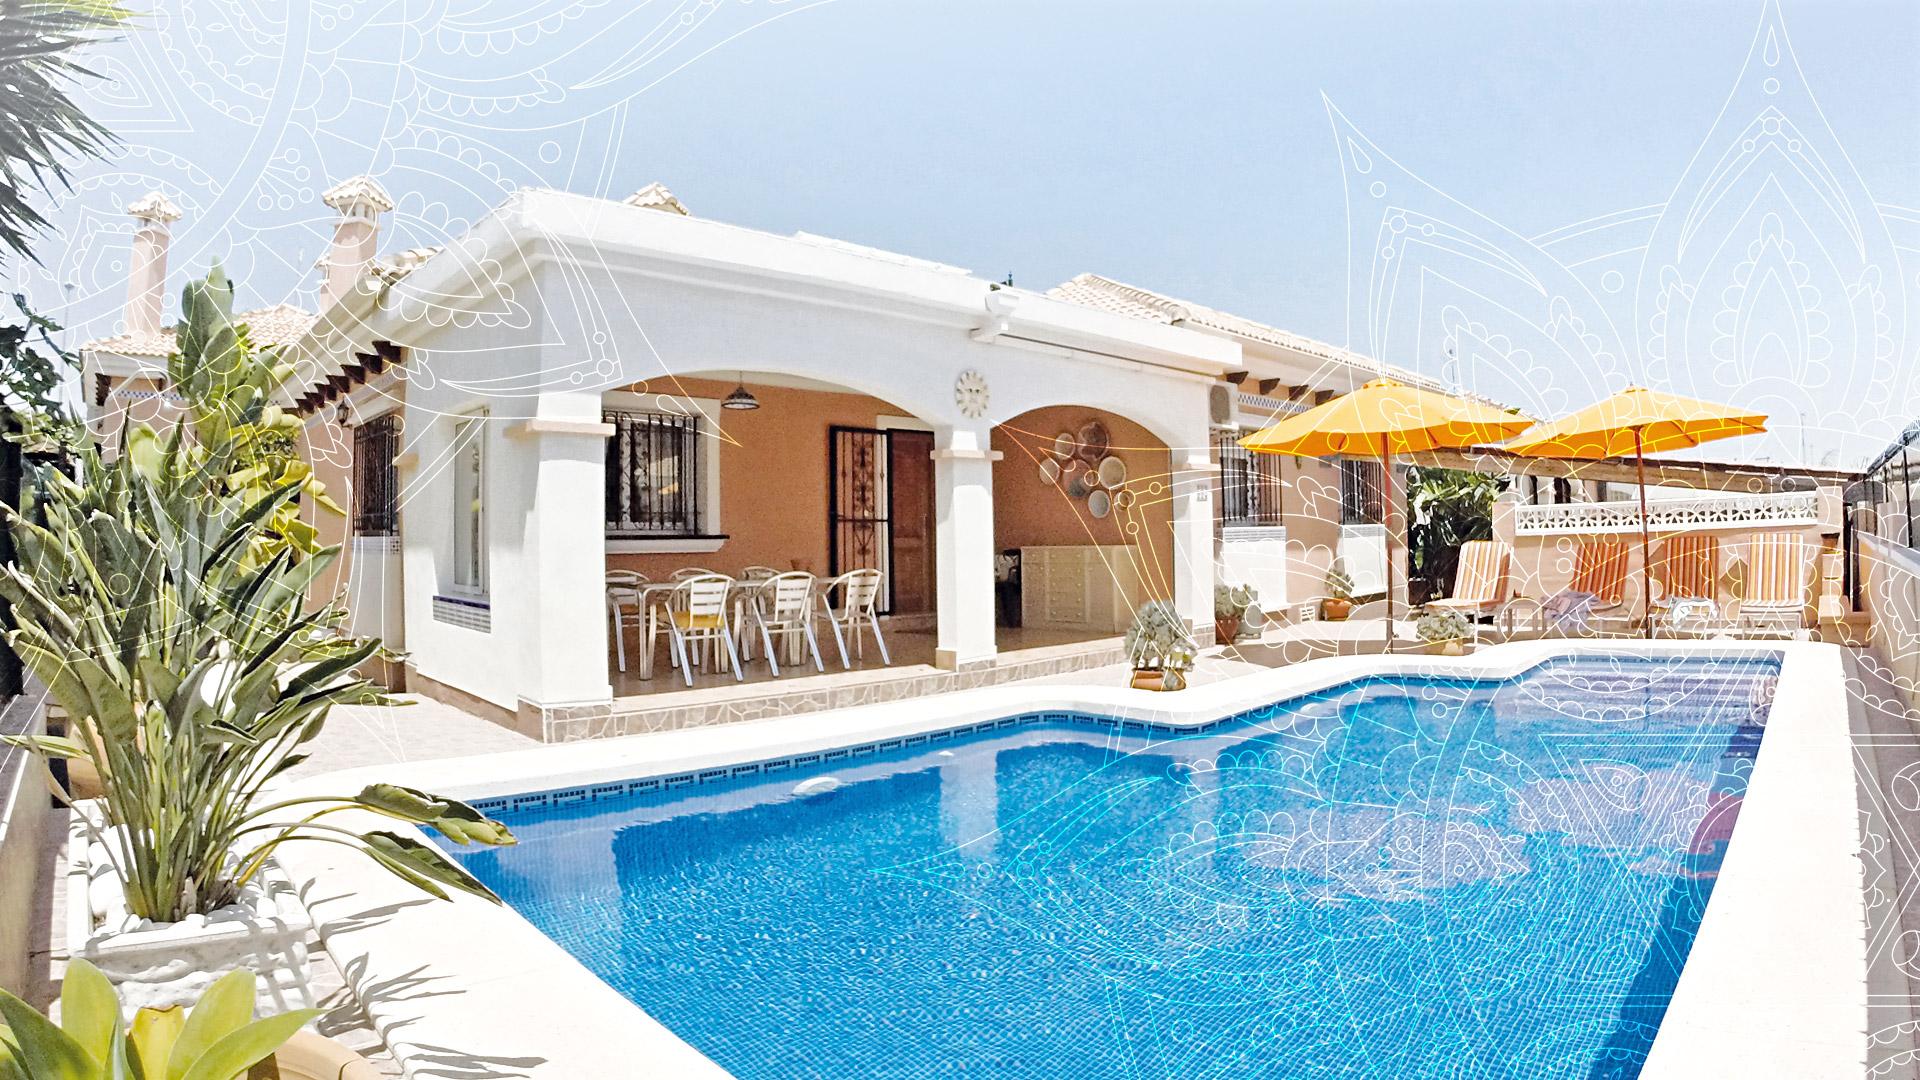 Casa Delano Home